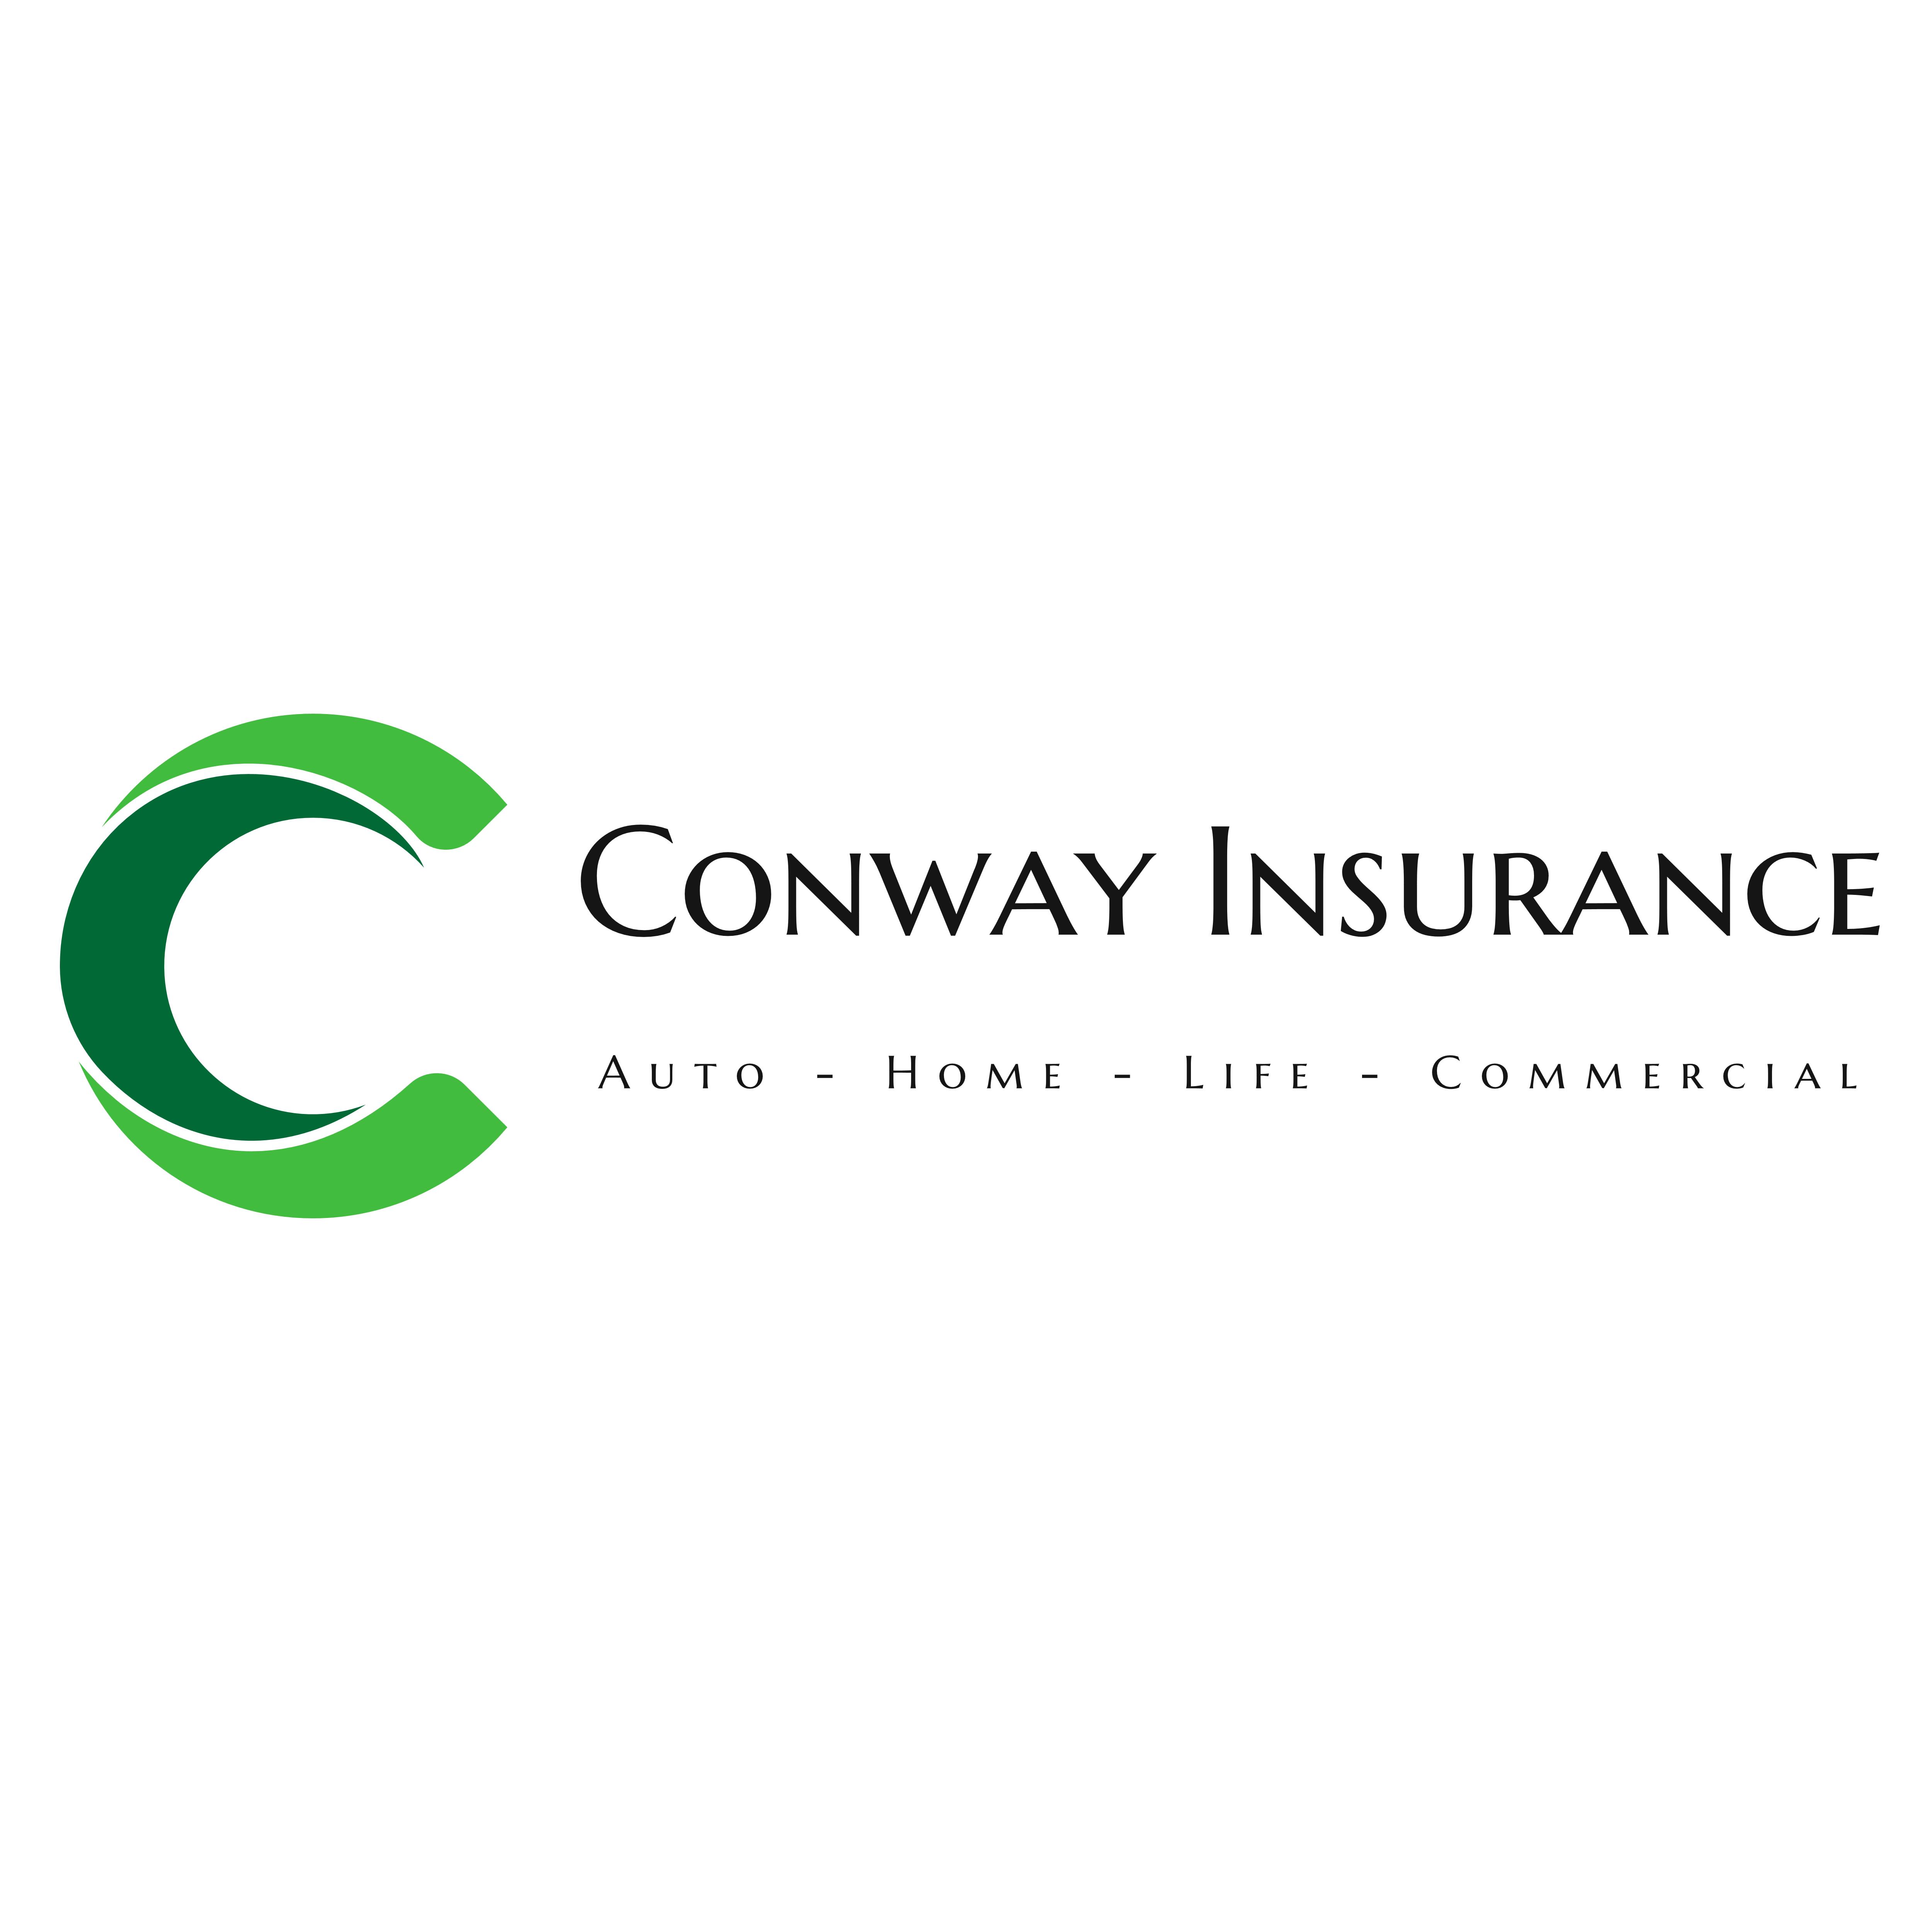 Conway Insurance, LLC